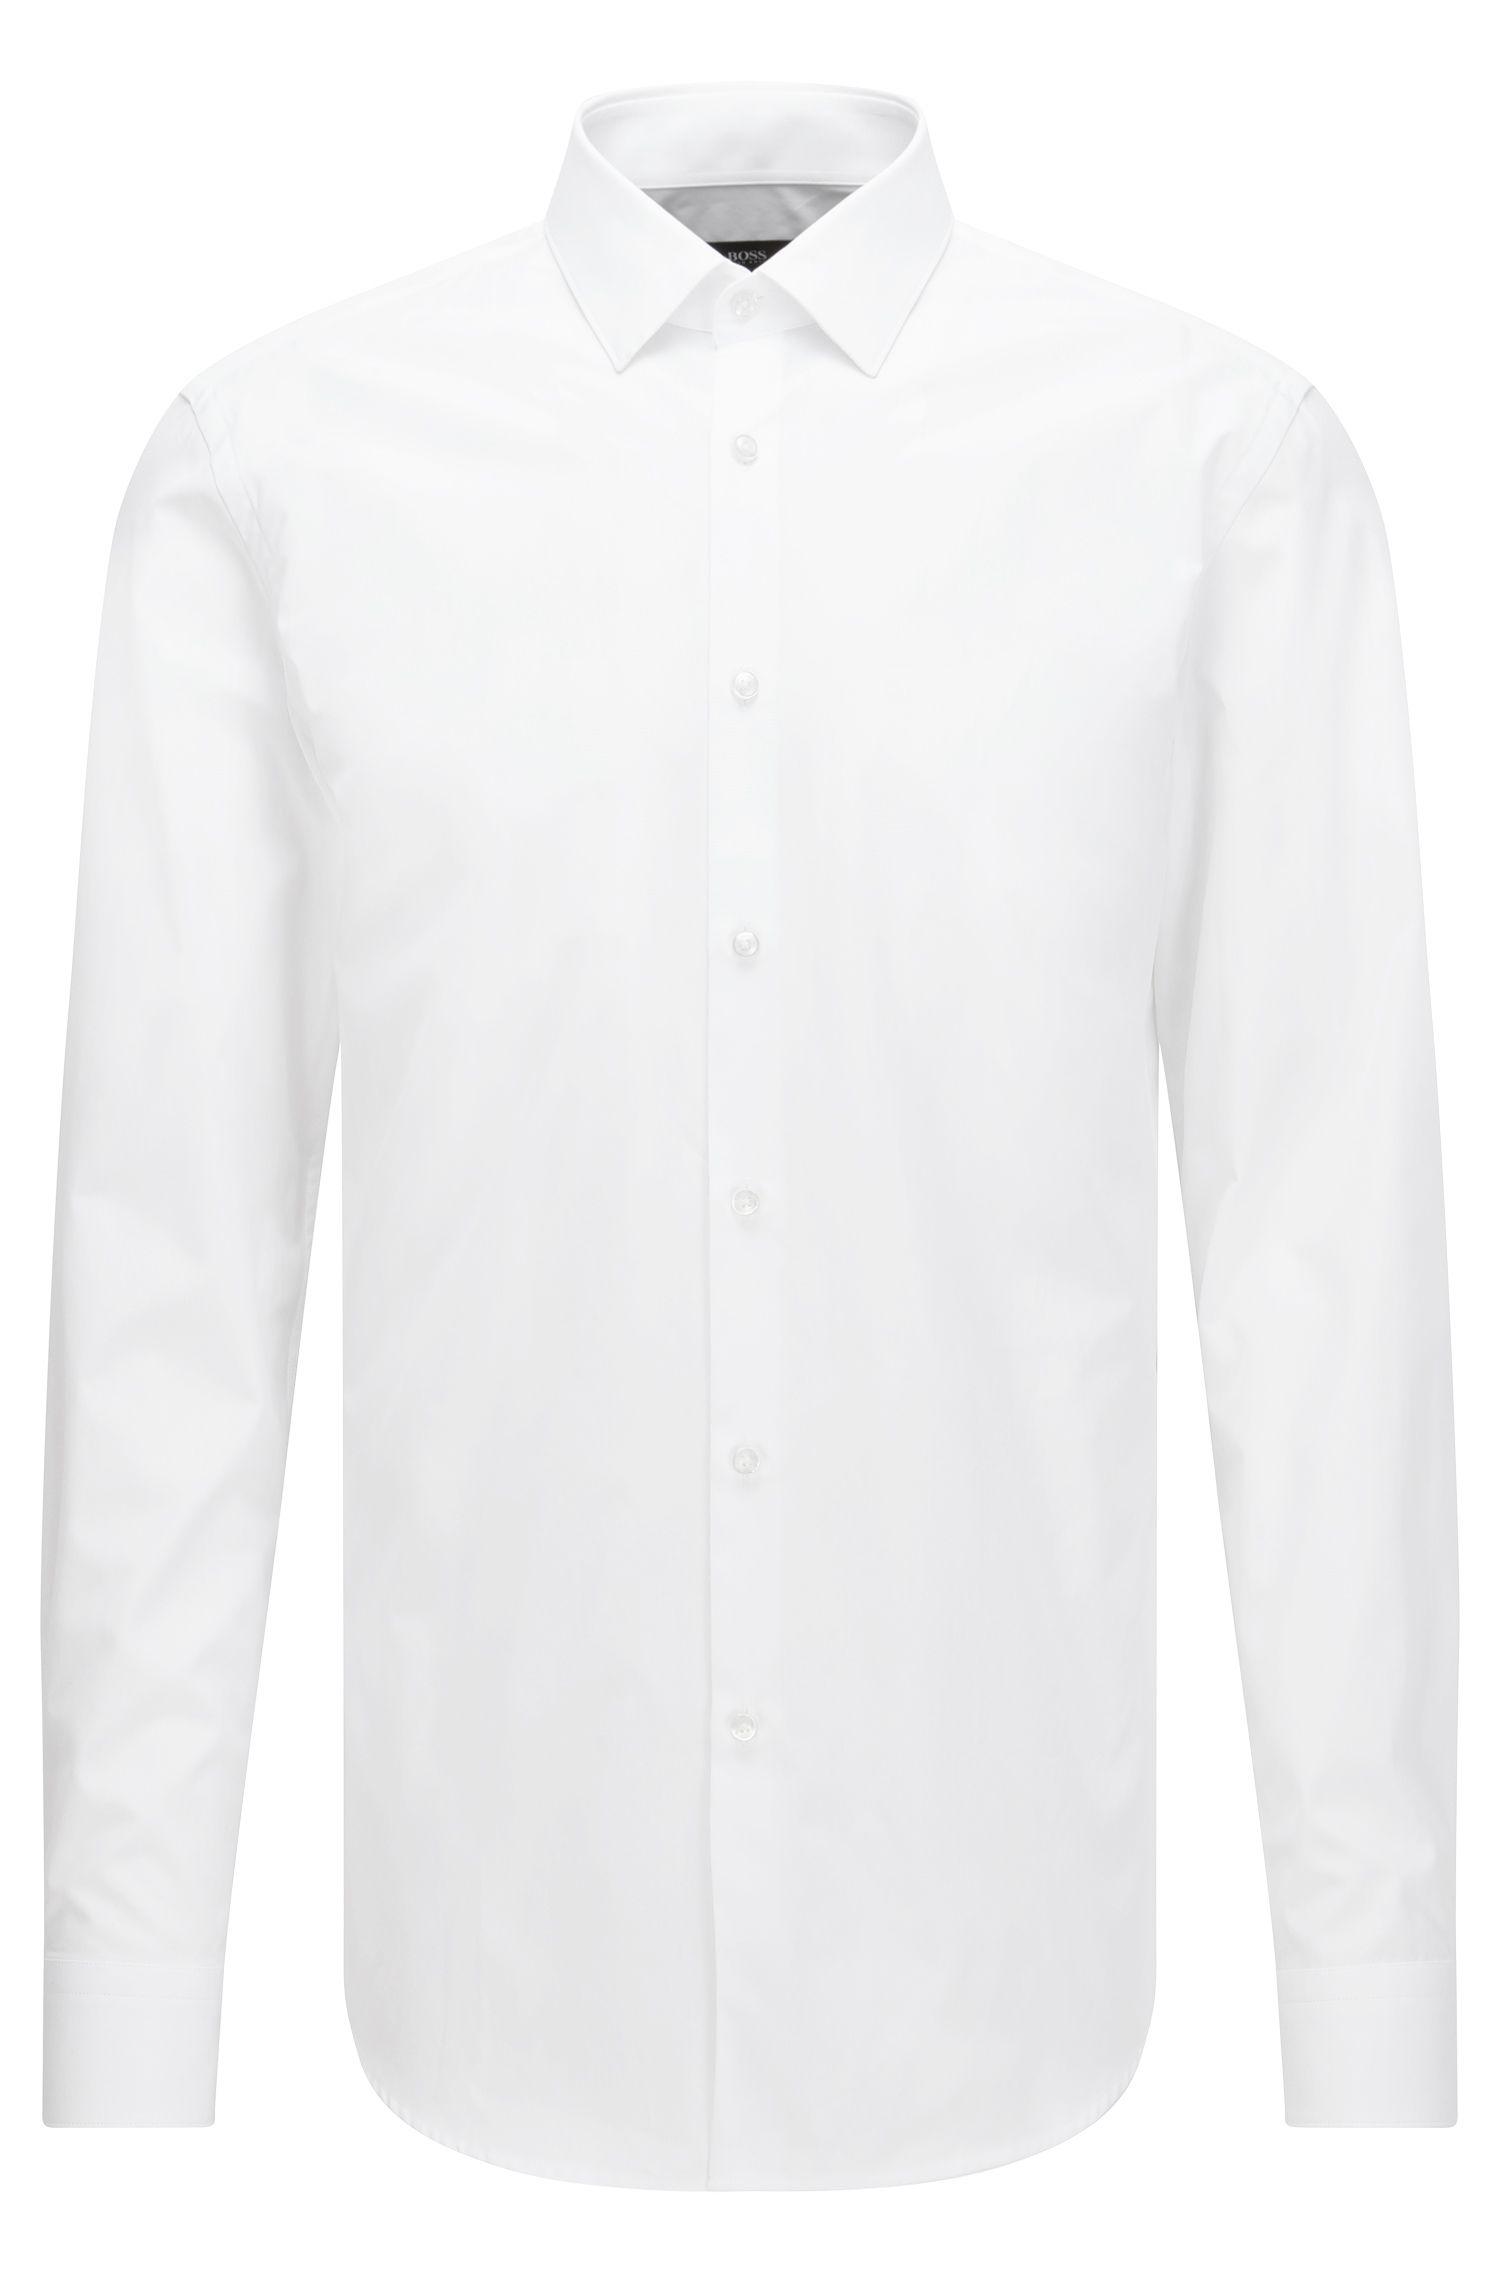 Two-Ply Cotton Dress Shirt, Slim Fit | Isko, White